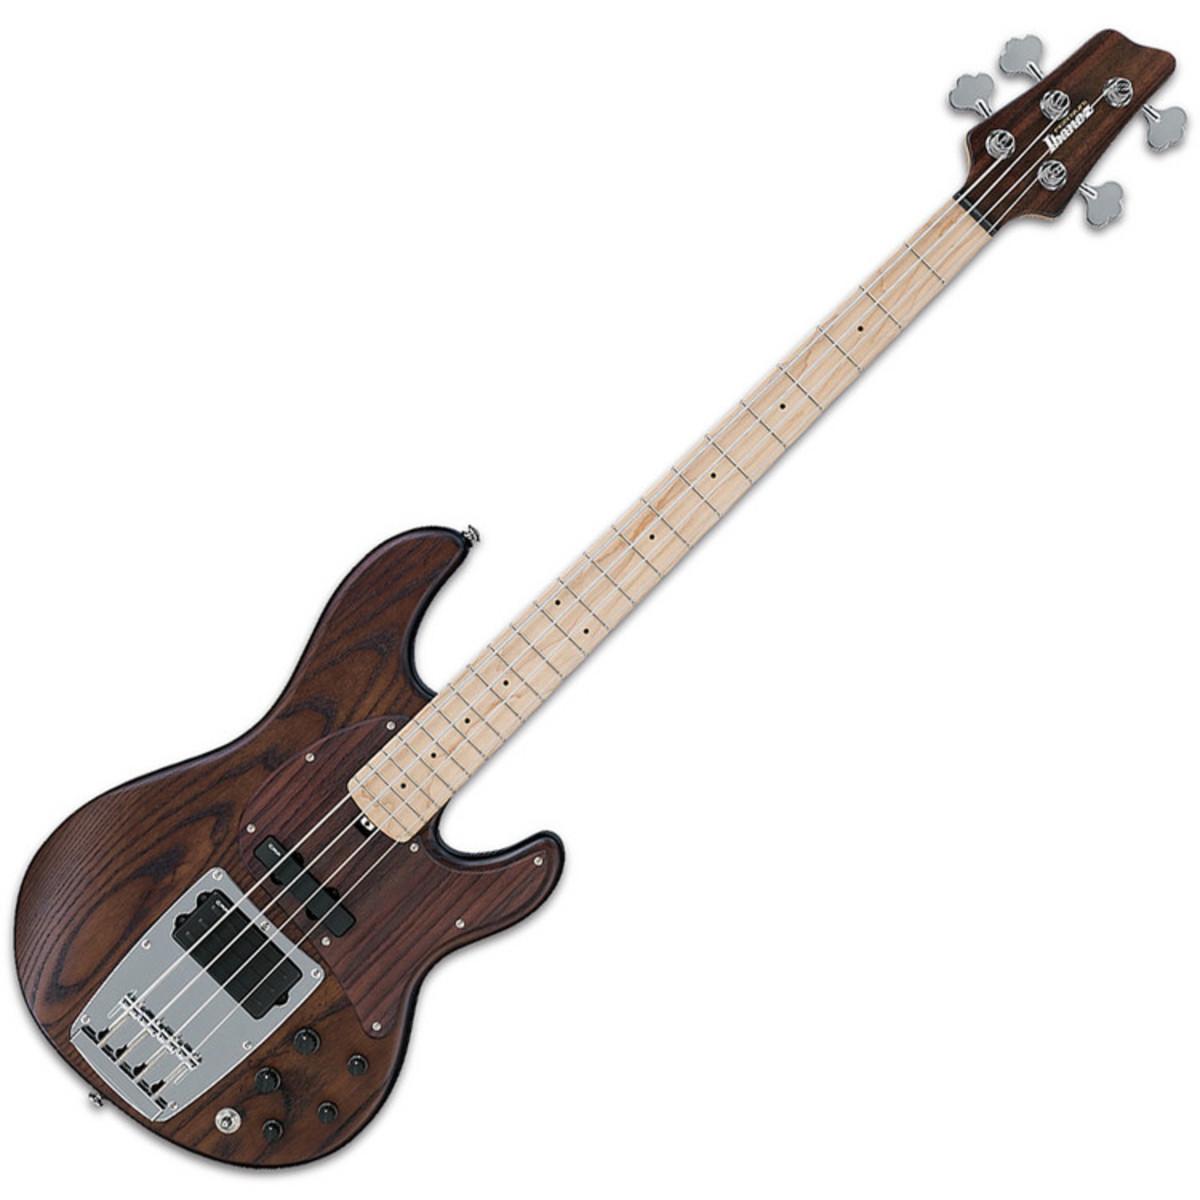 disc ibanez atk800 bass guitar walnut flat at gear4music. Black Bedroom Furniture Sets. Home Design Ideas